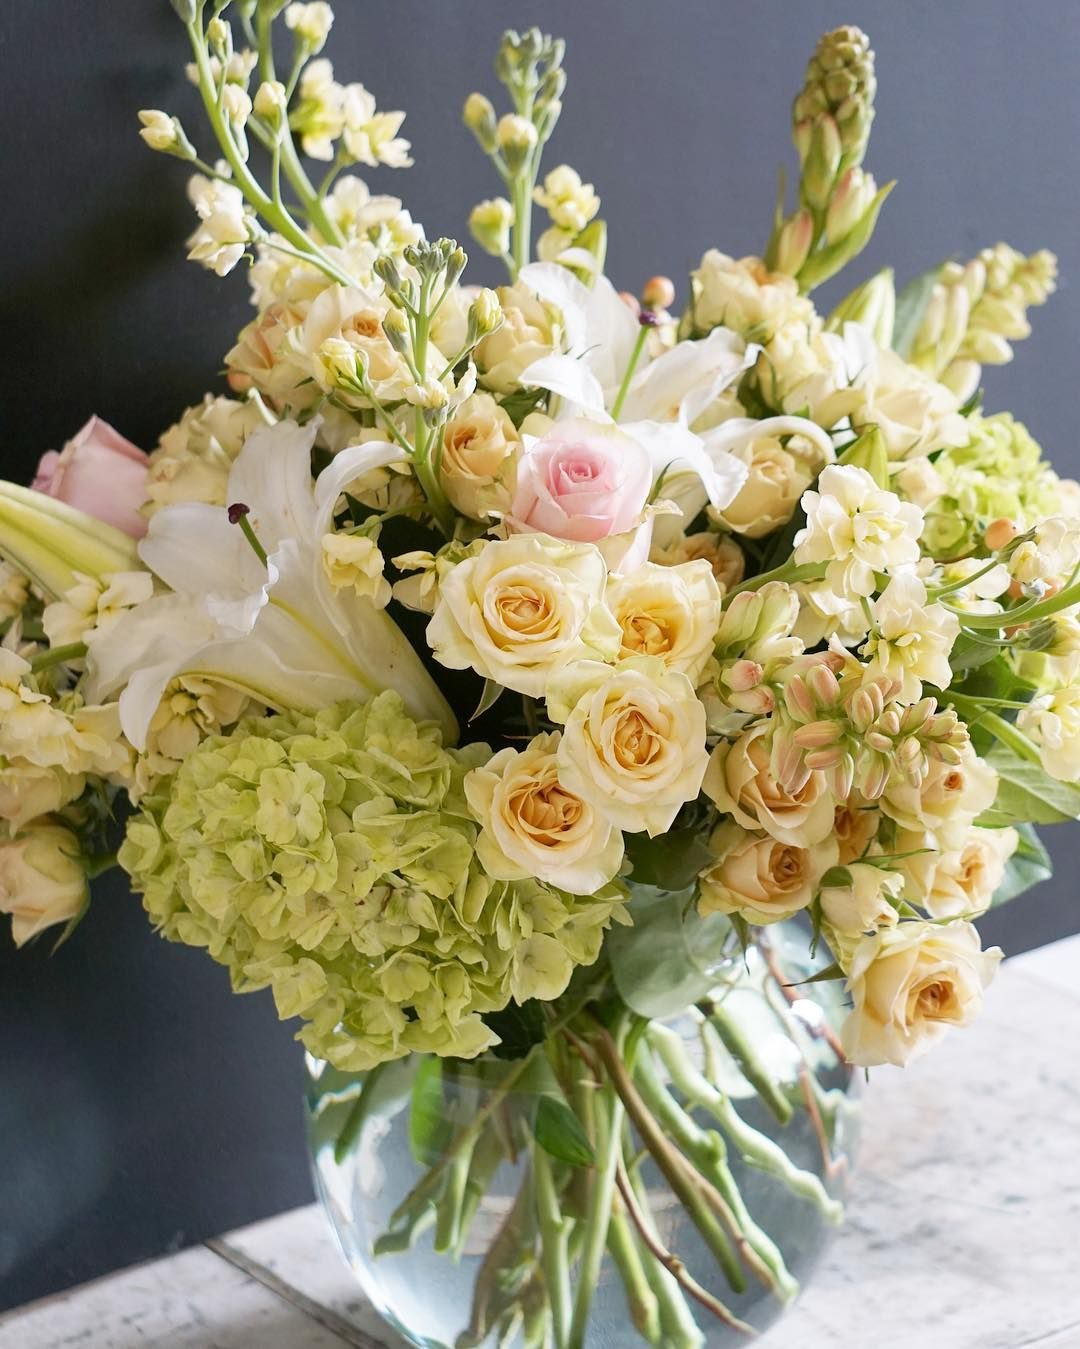 Httpcatelliyafloristbanjarnegaraspot201704toko httpcatelliyafloristbanjarnegaraspot201704 large floral arrangementshand bouquetfloral designfresh izmirmasajfo